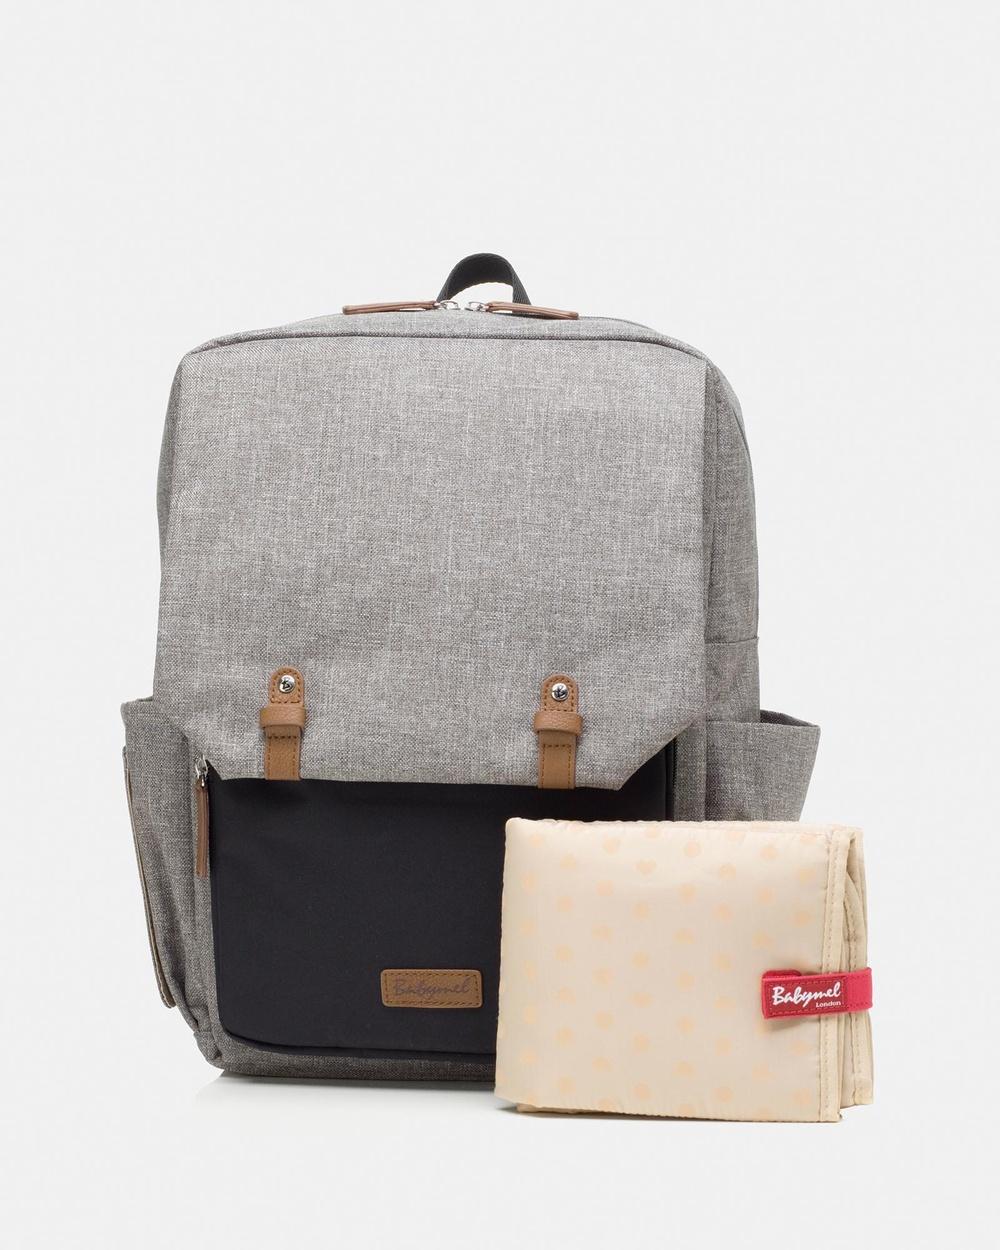 Babymel George Backpack Nappy Bag Backpacks Black & Grey